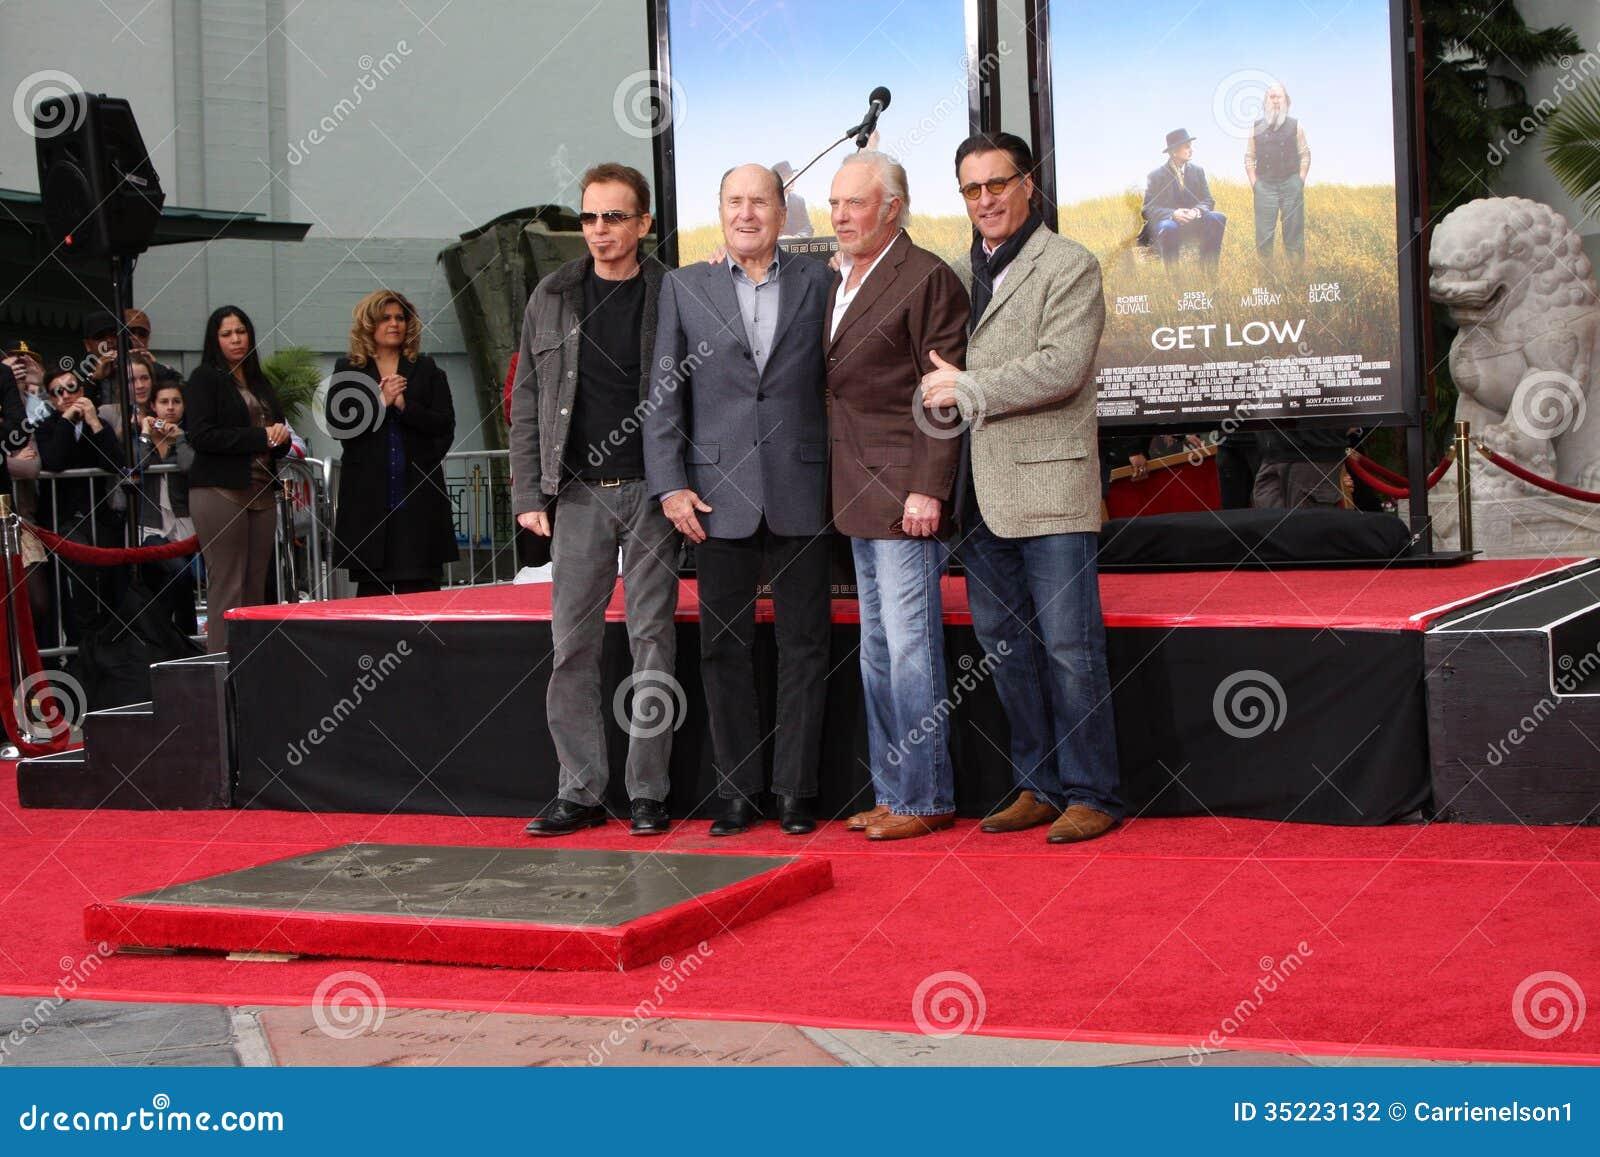 Andy Garcia, Billy Bob Thornton, James Caan, Robert Duvall